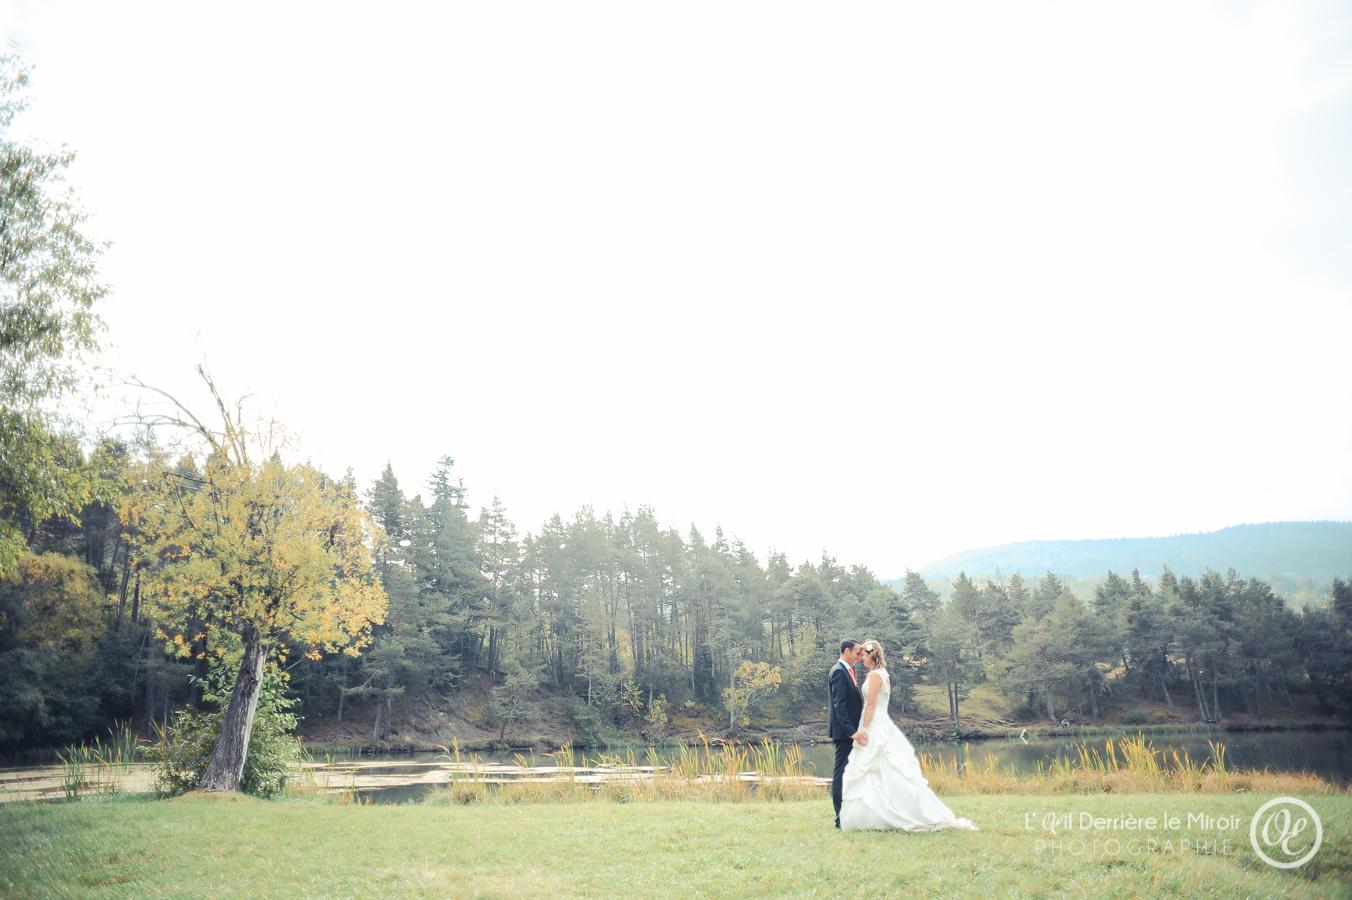 After-wedding-Audrey-Luis-loeilderrierelemiroir-31